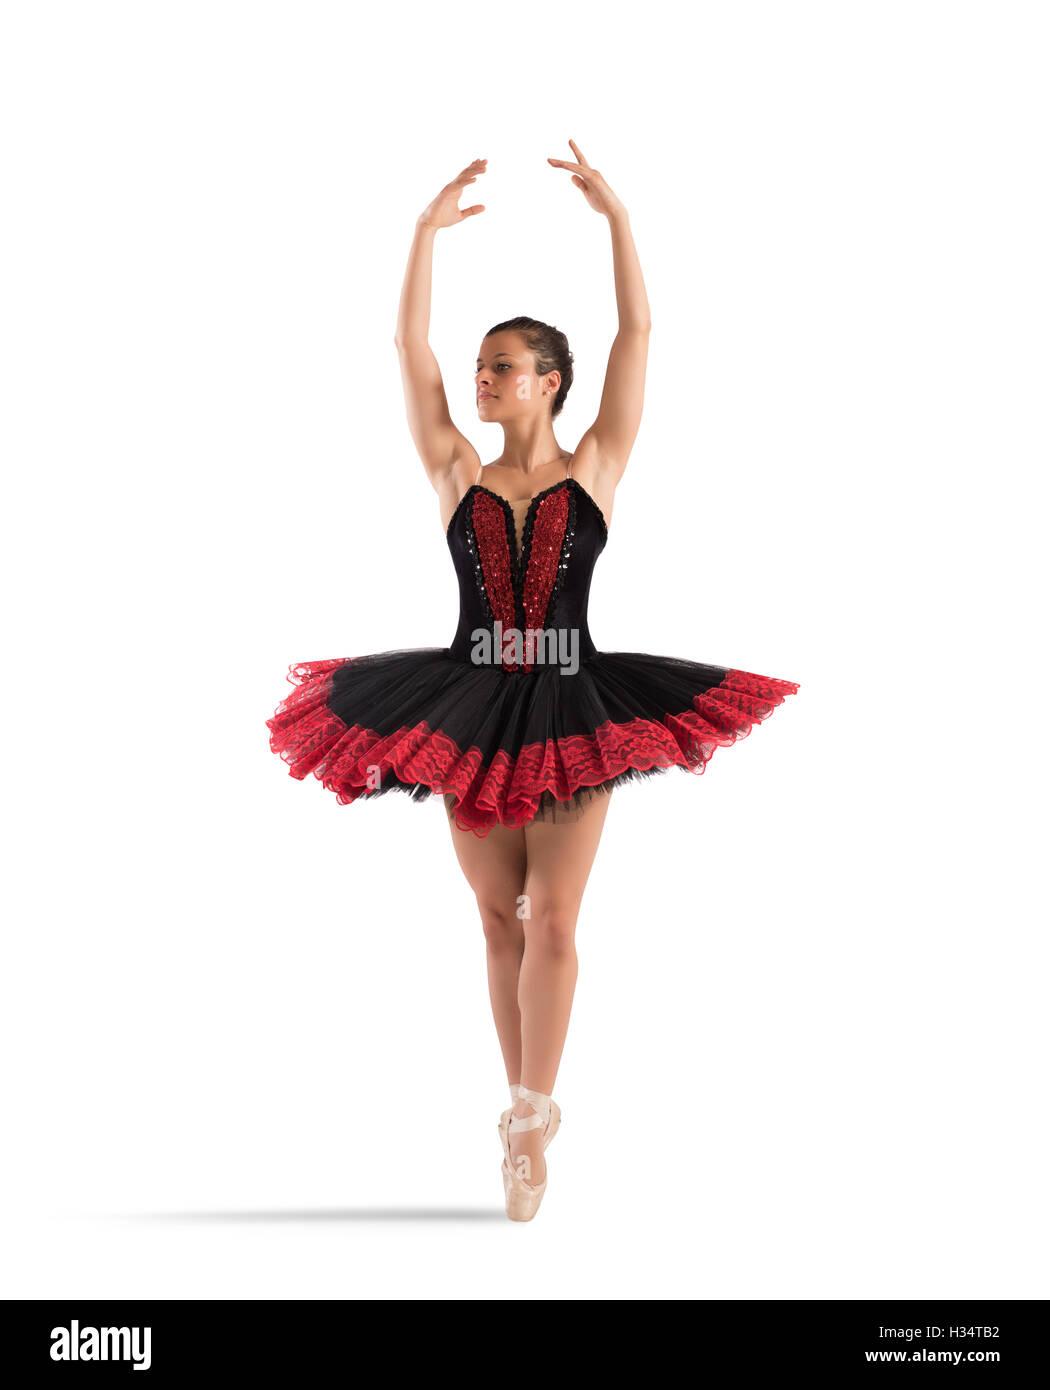 Classical dancer pose - Stock Image